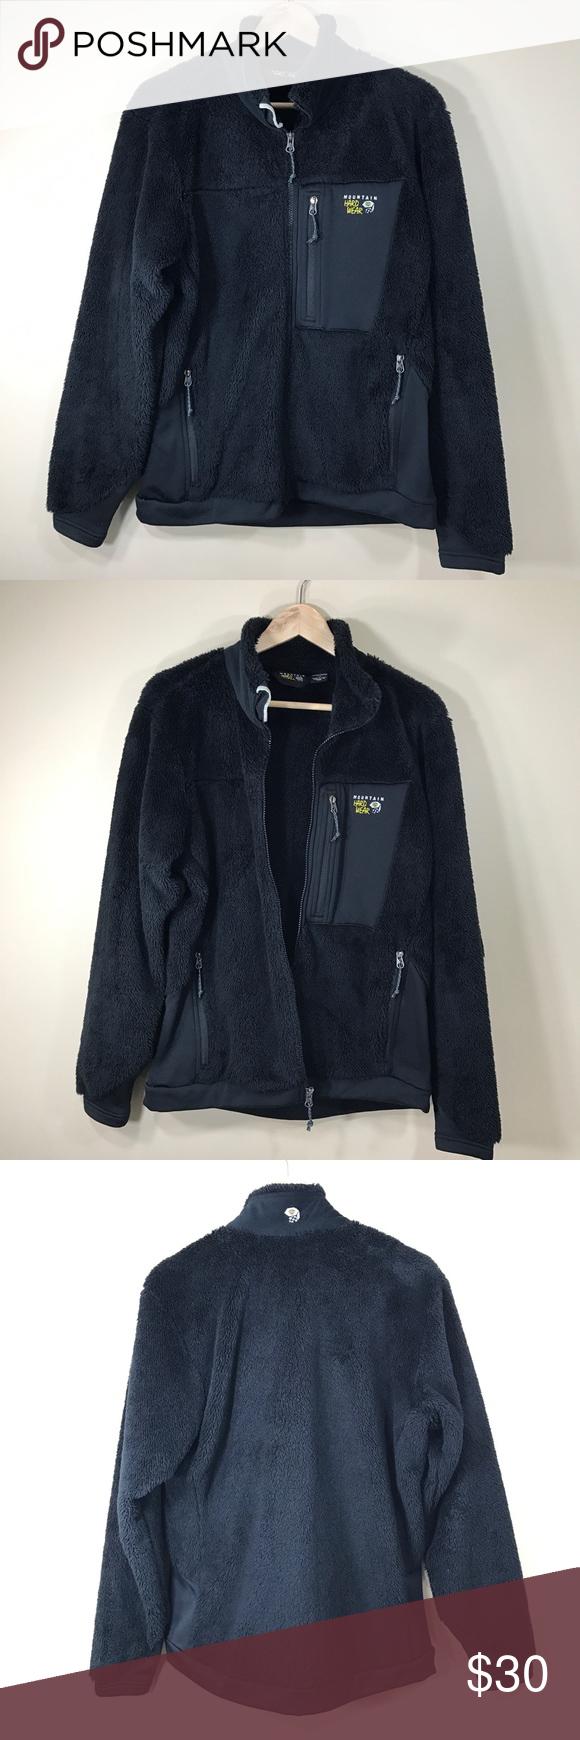 Mountain hardware black fleece jacket size l mountain hardwear